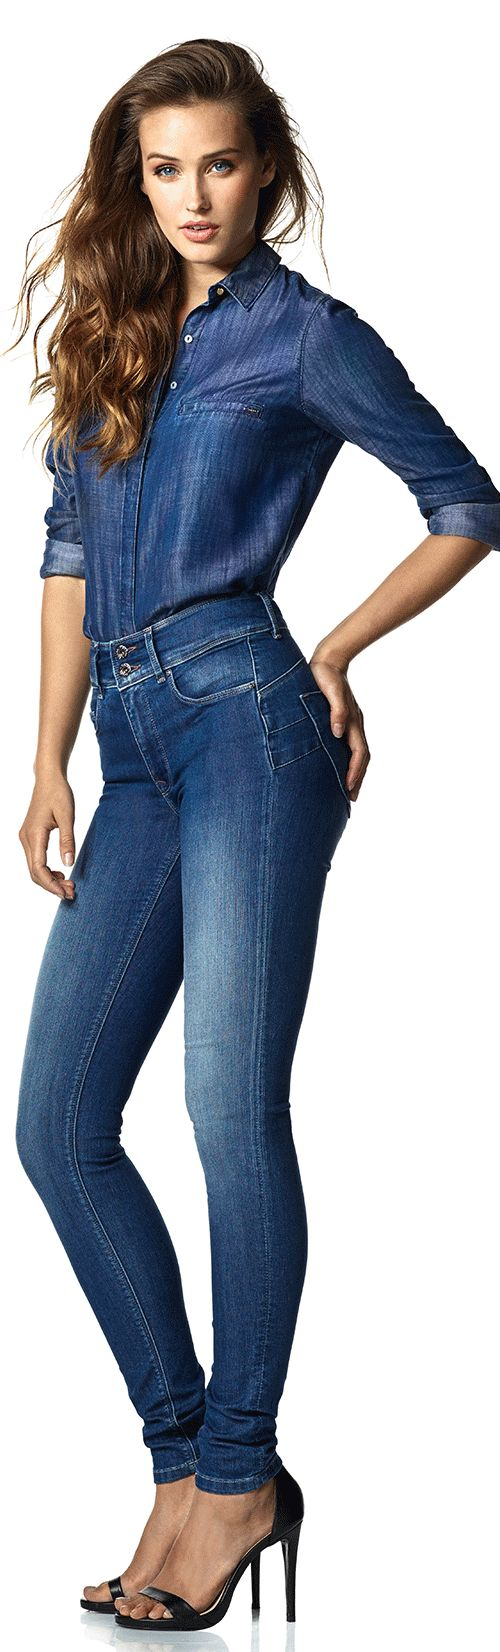 Secret Push In Jeans | Shop women's jeans at Salsa online store